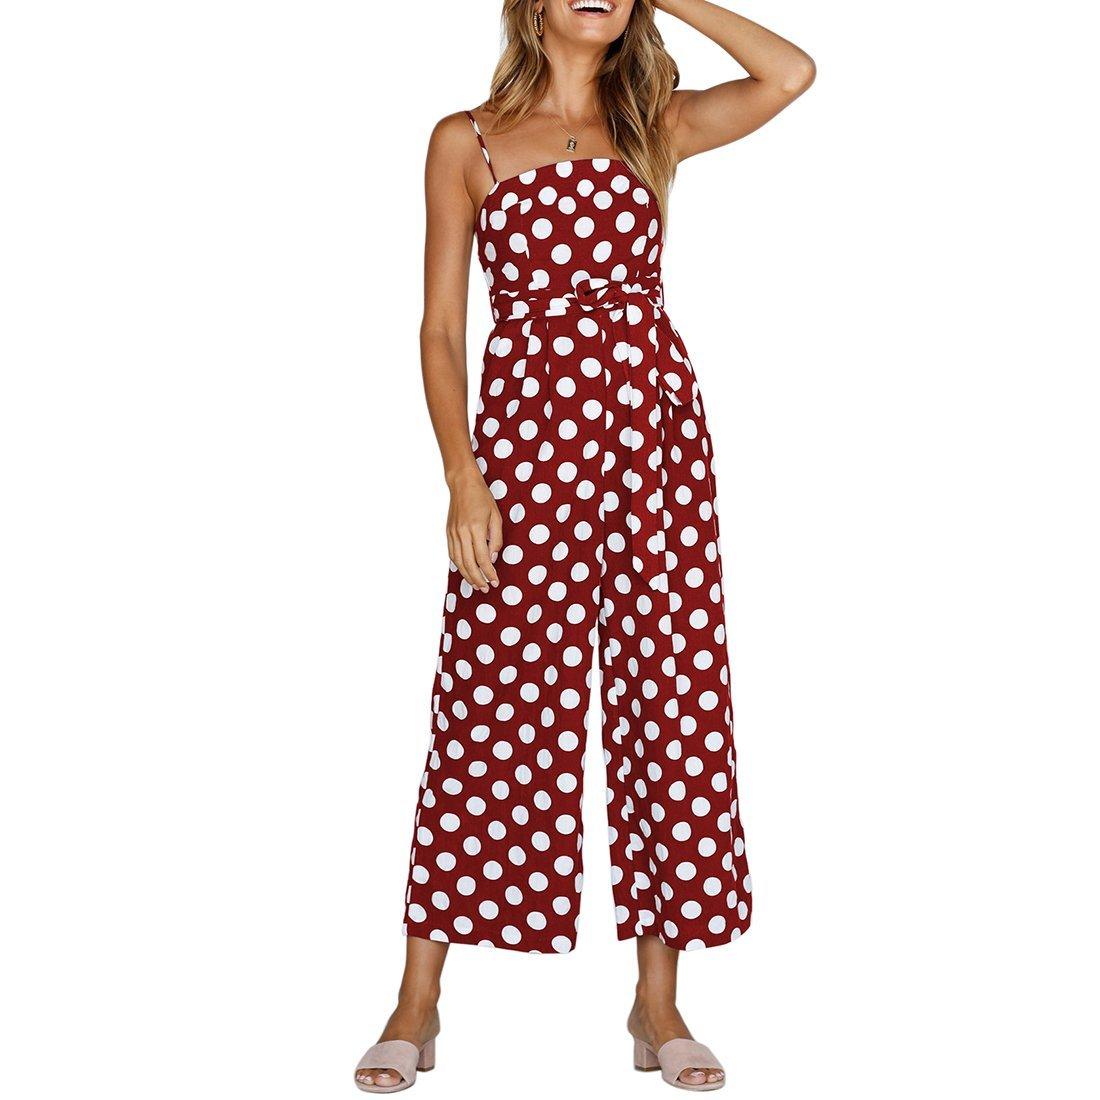 Shinekoo Women Holiday Playsuit Strap Sleeveless Off Shoulder Polka Dot Long Wide Leg Boohoo Beach Jumpsuit